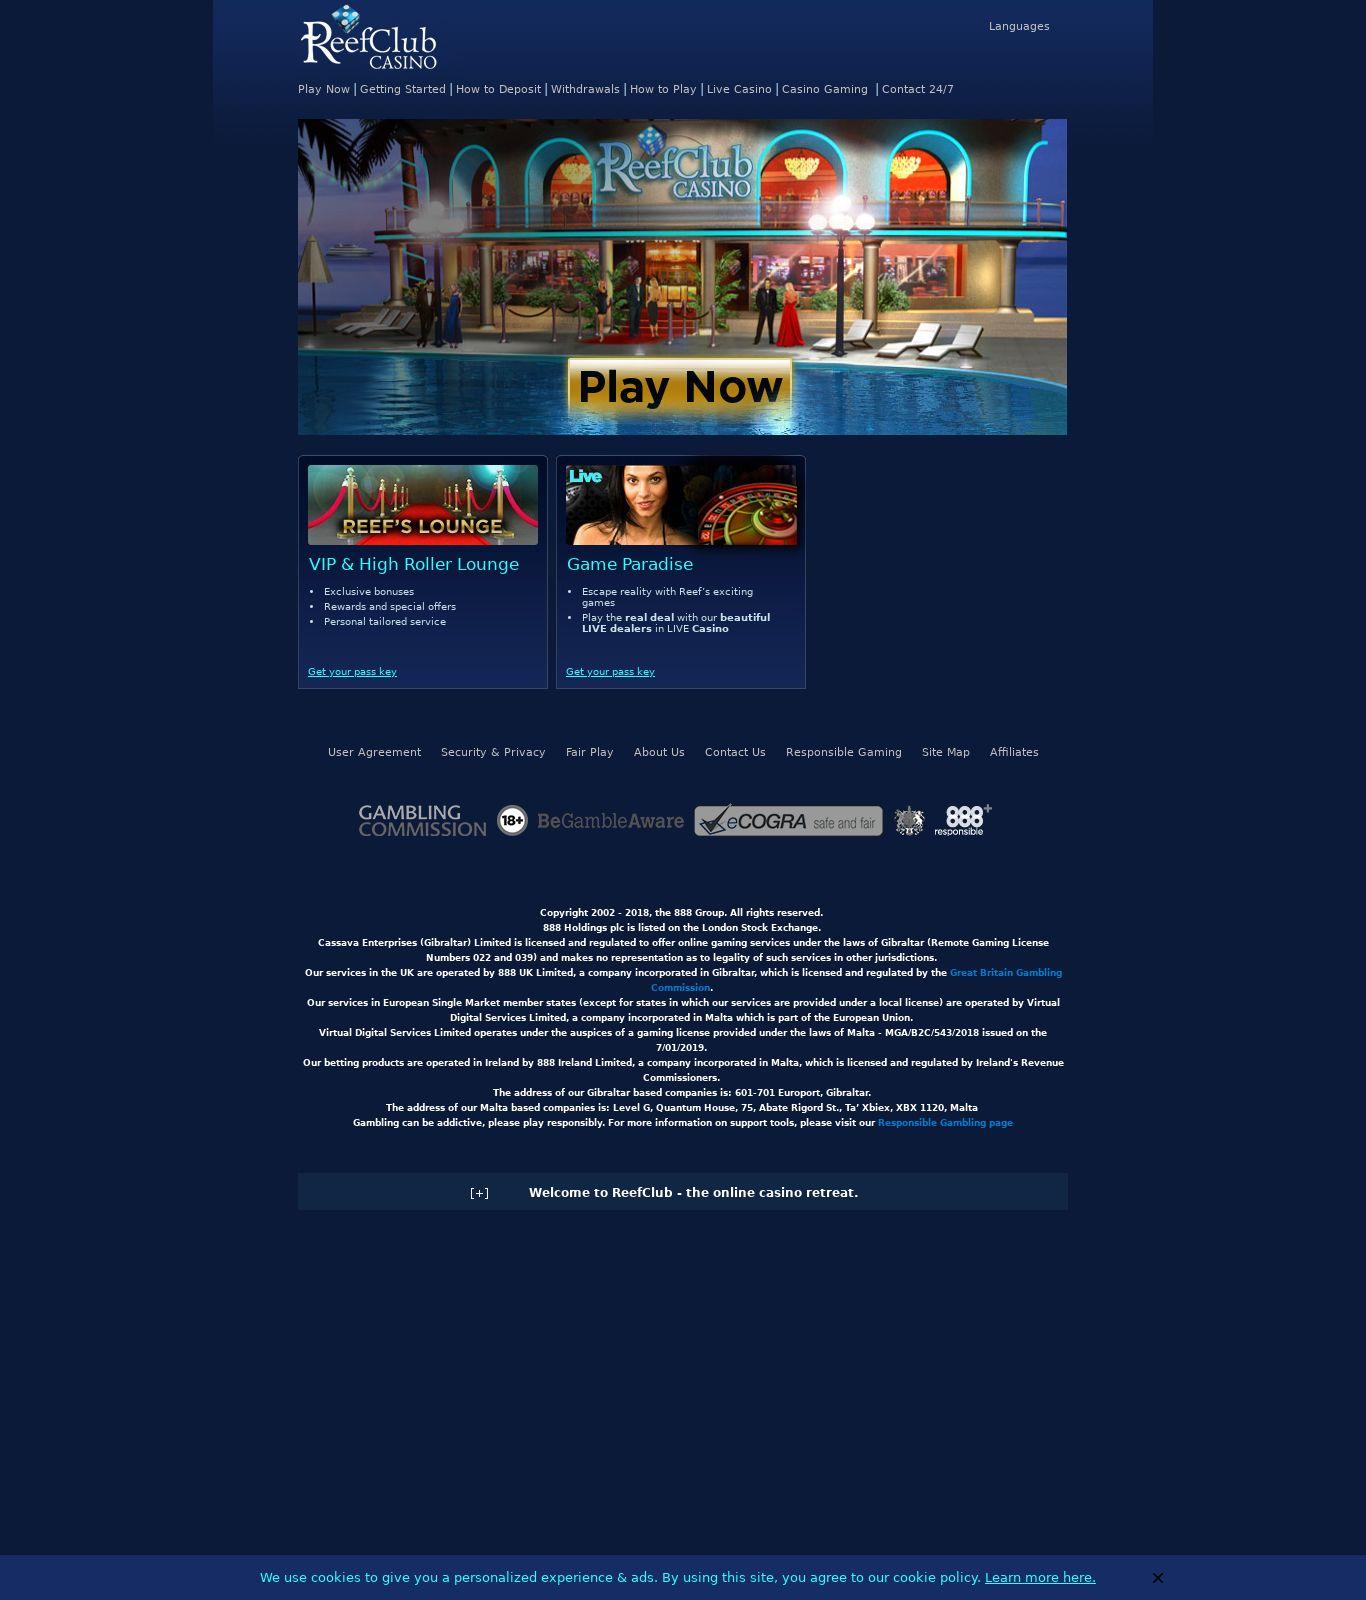 Reef Club Casino Review